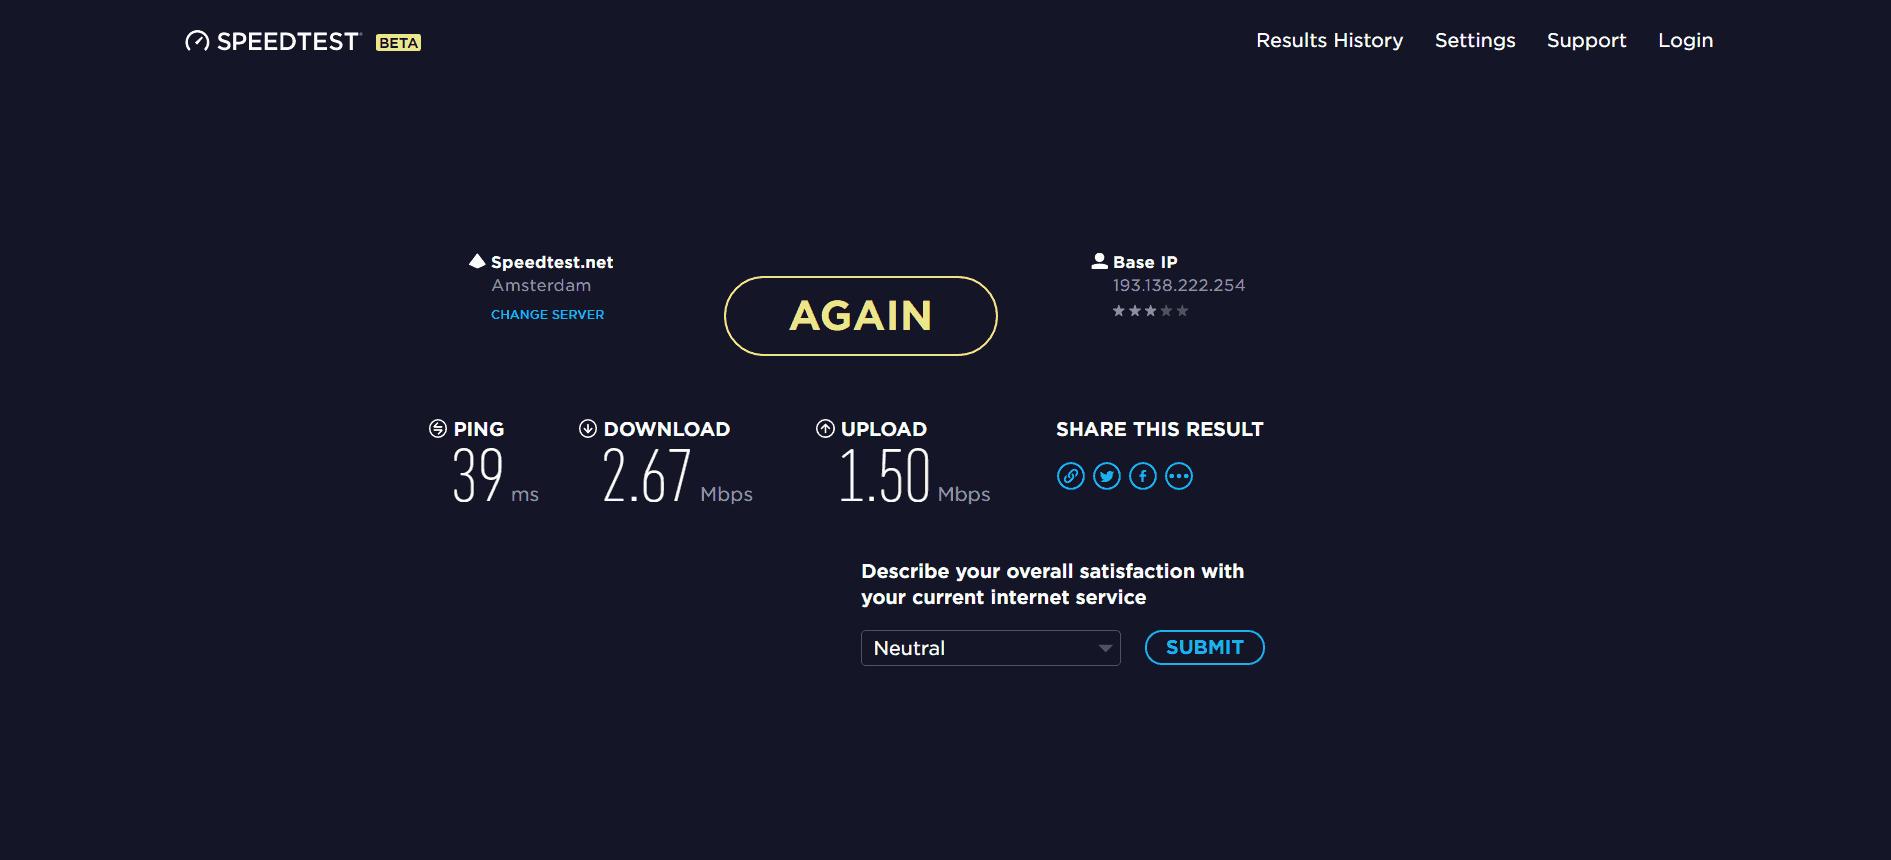 StrongVPN speed was slow